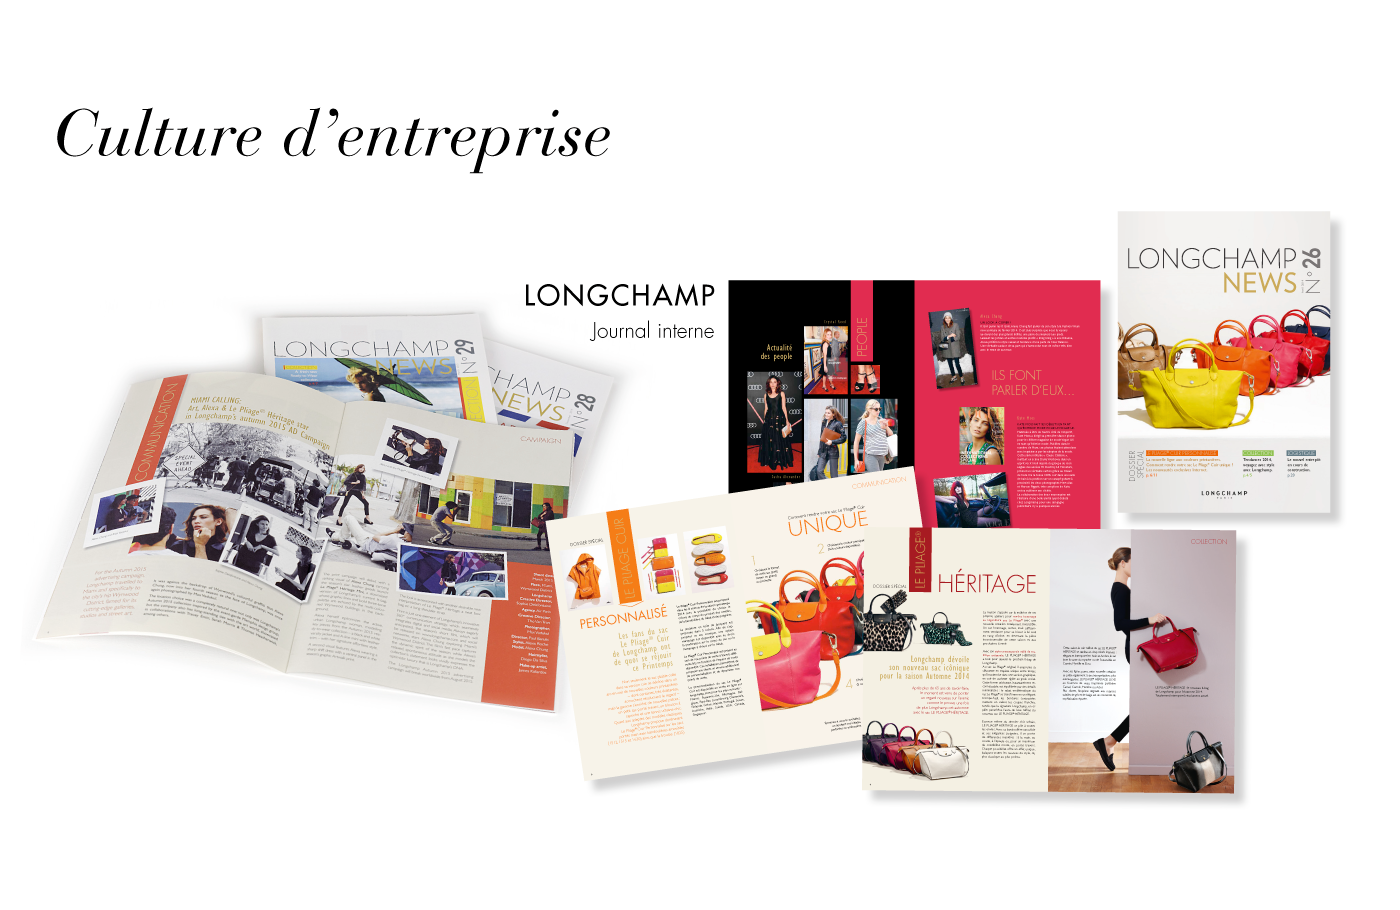 Longchamp-5